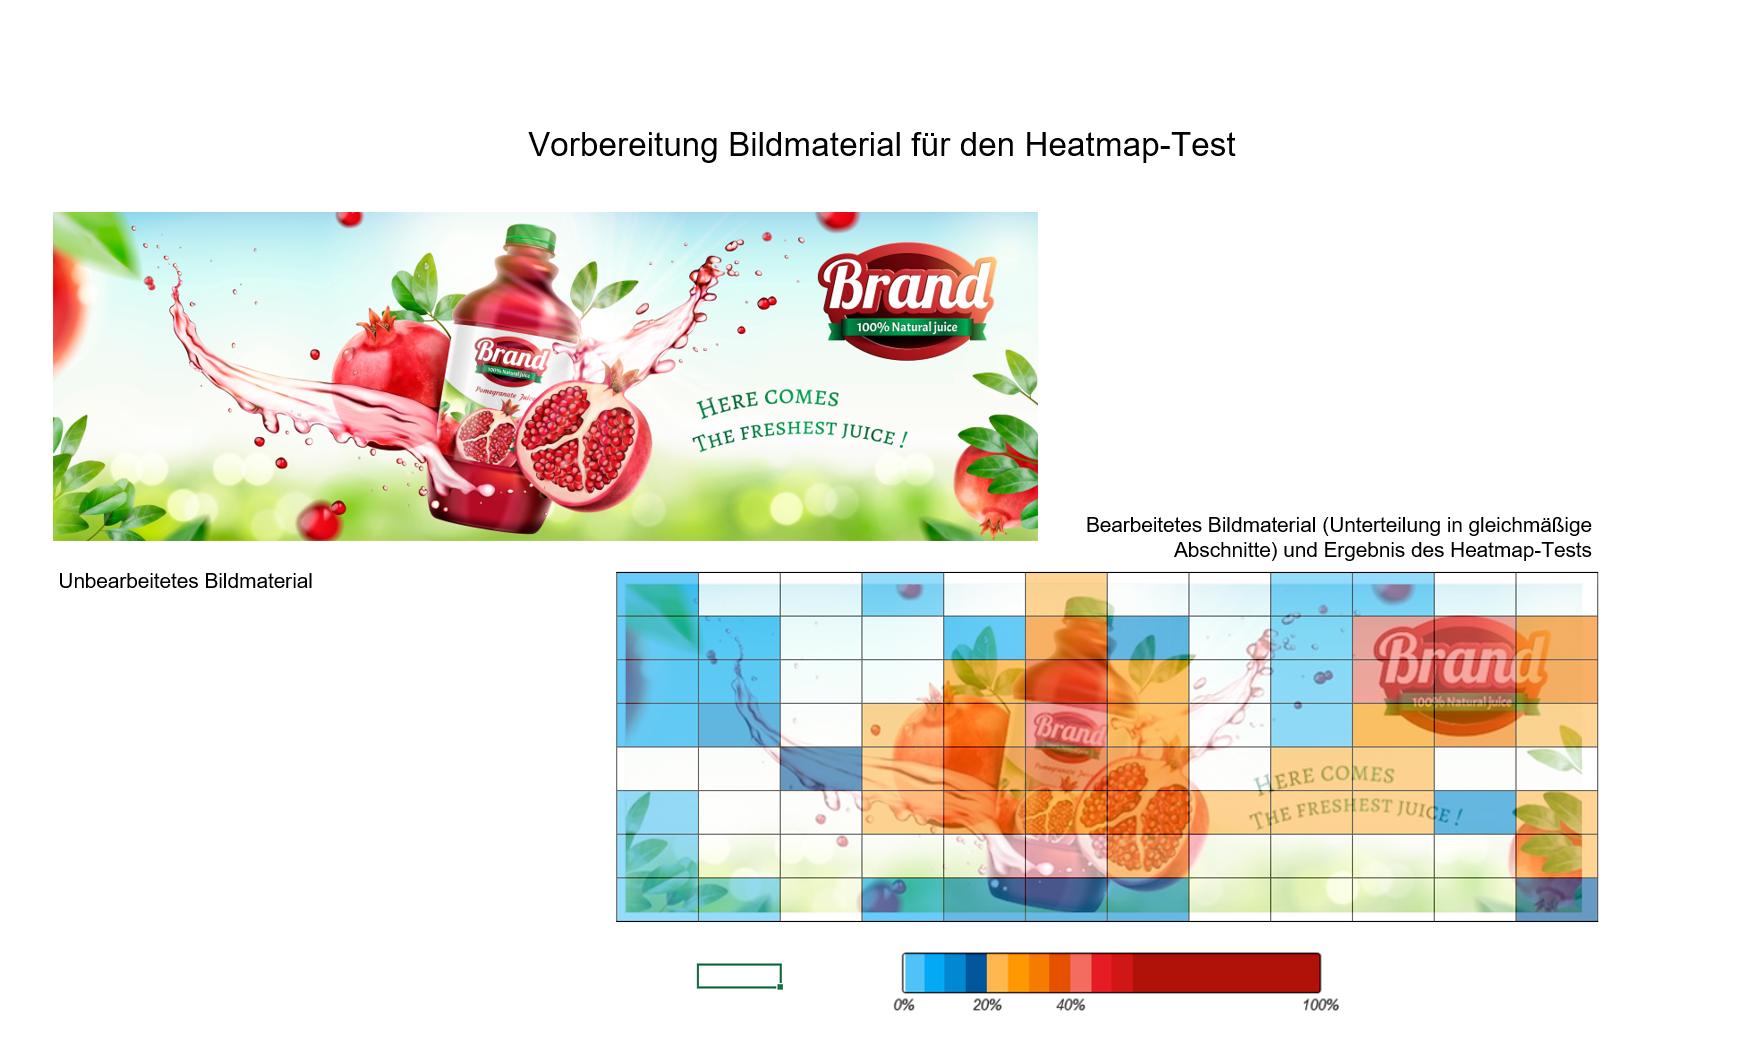 Vorbereitung Bildmaterial Heatmap-Test